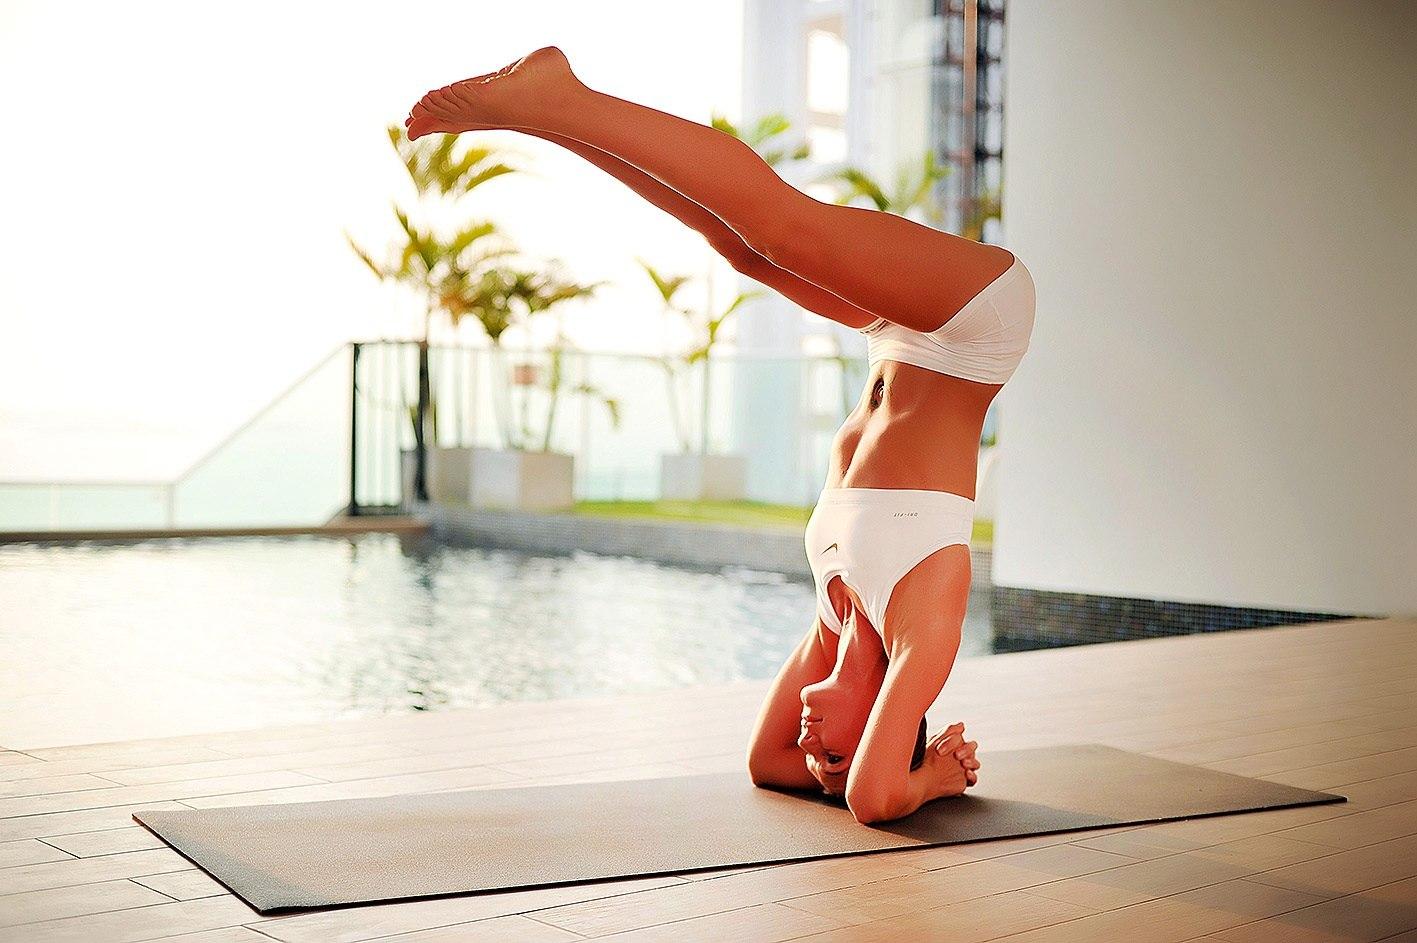 Домашняя йога — эффективная альтернатива диетам